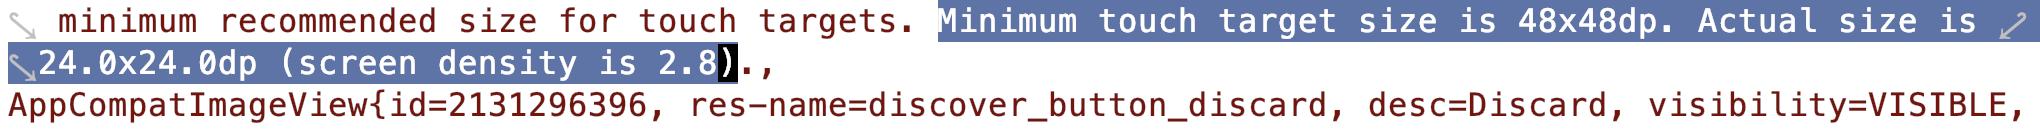 Minimum touch target size is 48x48dp.